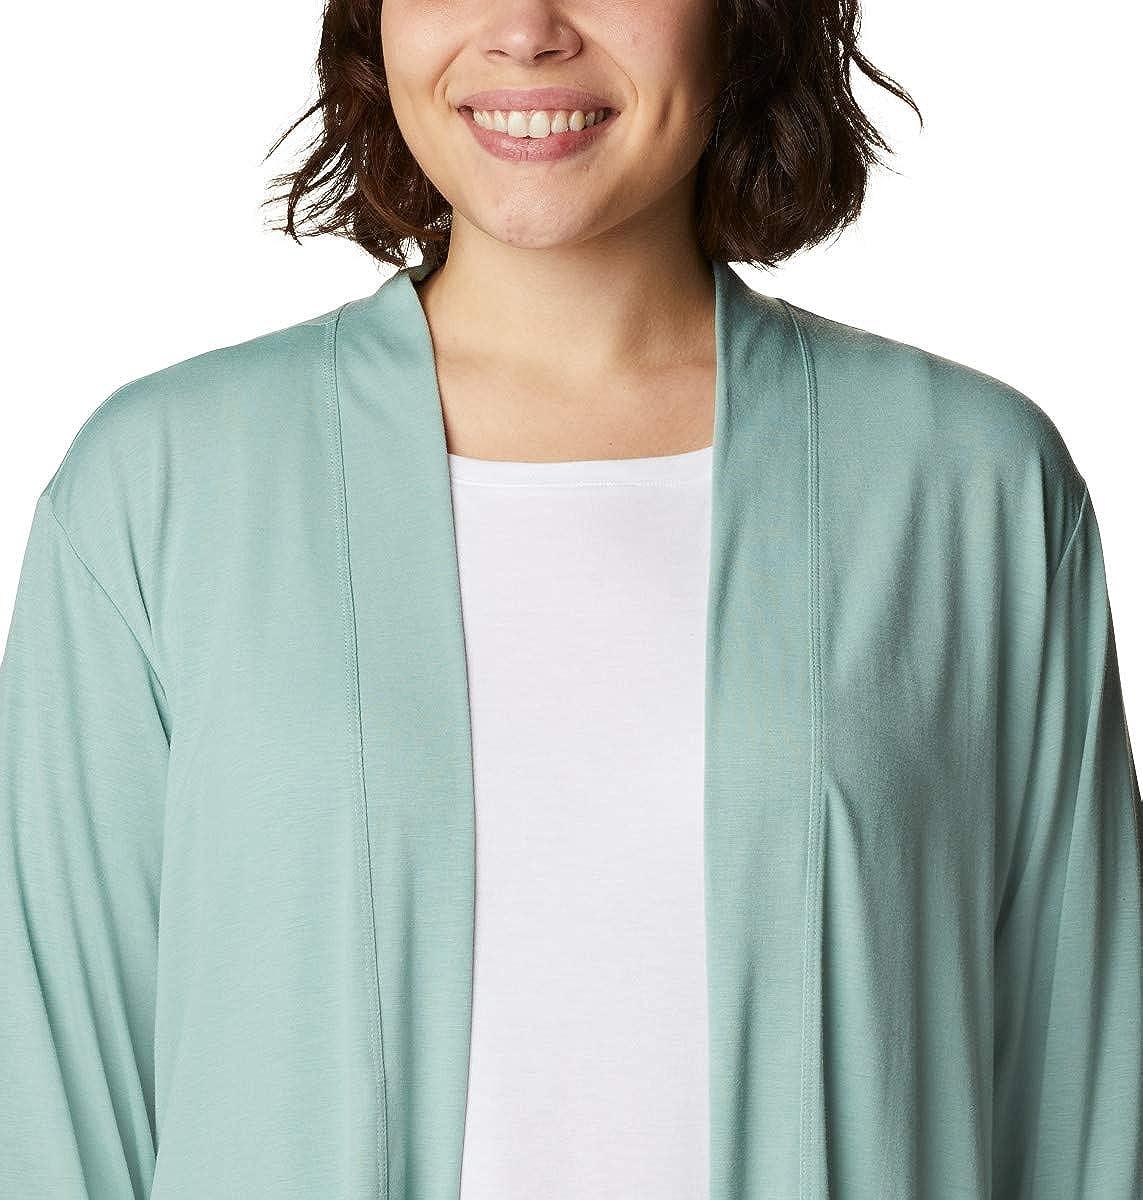 Columbia Women's Essential Elements Cardigan, Moisture Wicking, Sun Protection